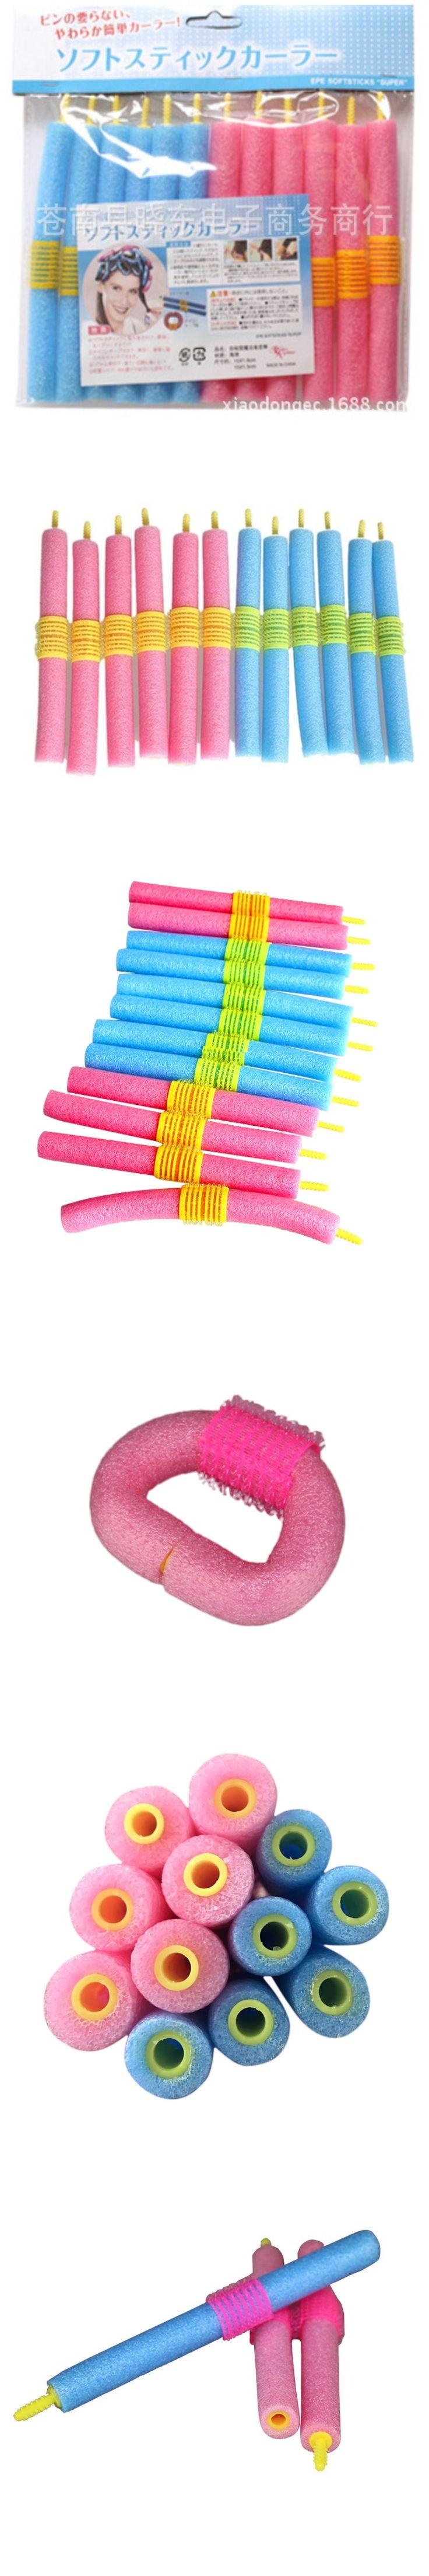 12pcs/lot New Foam Curler Popular Magical Anion Hair Curler Soft Pearl Sponge Hair Care Styling Roll Stick Roller Curler LL5